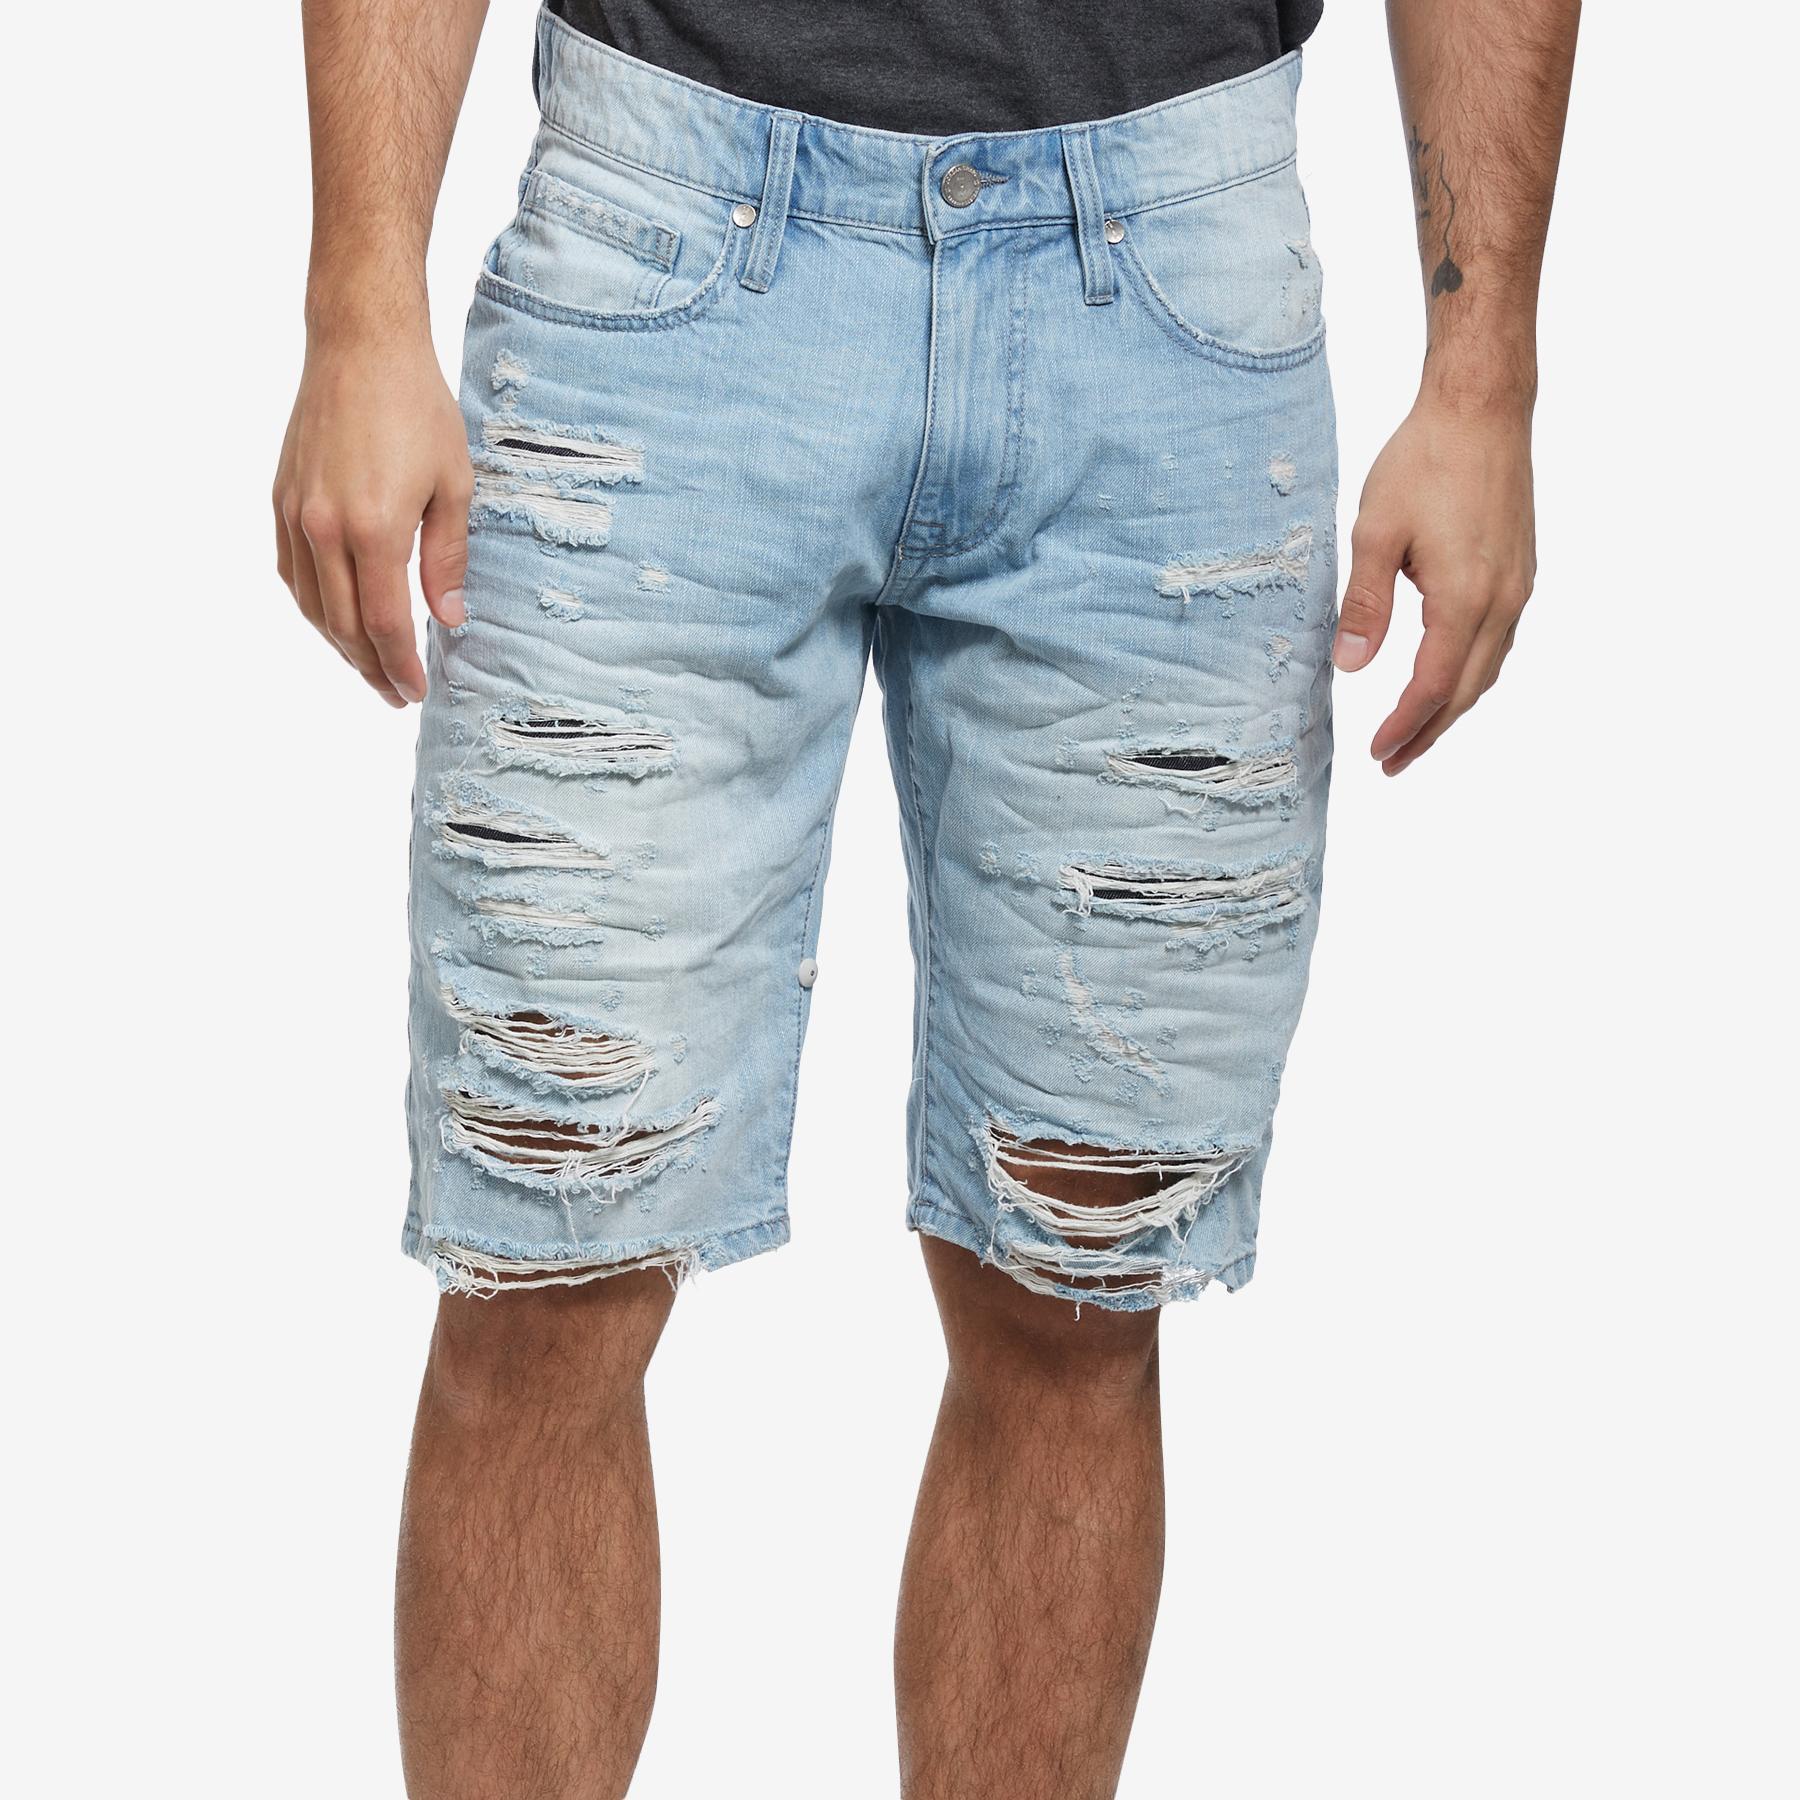 Men's Fashion Shorts